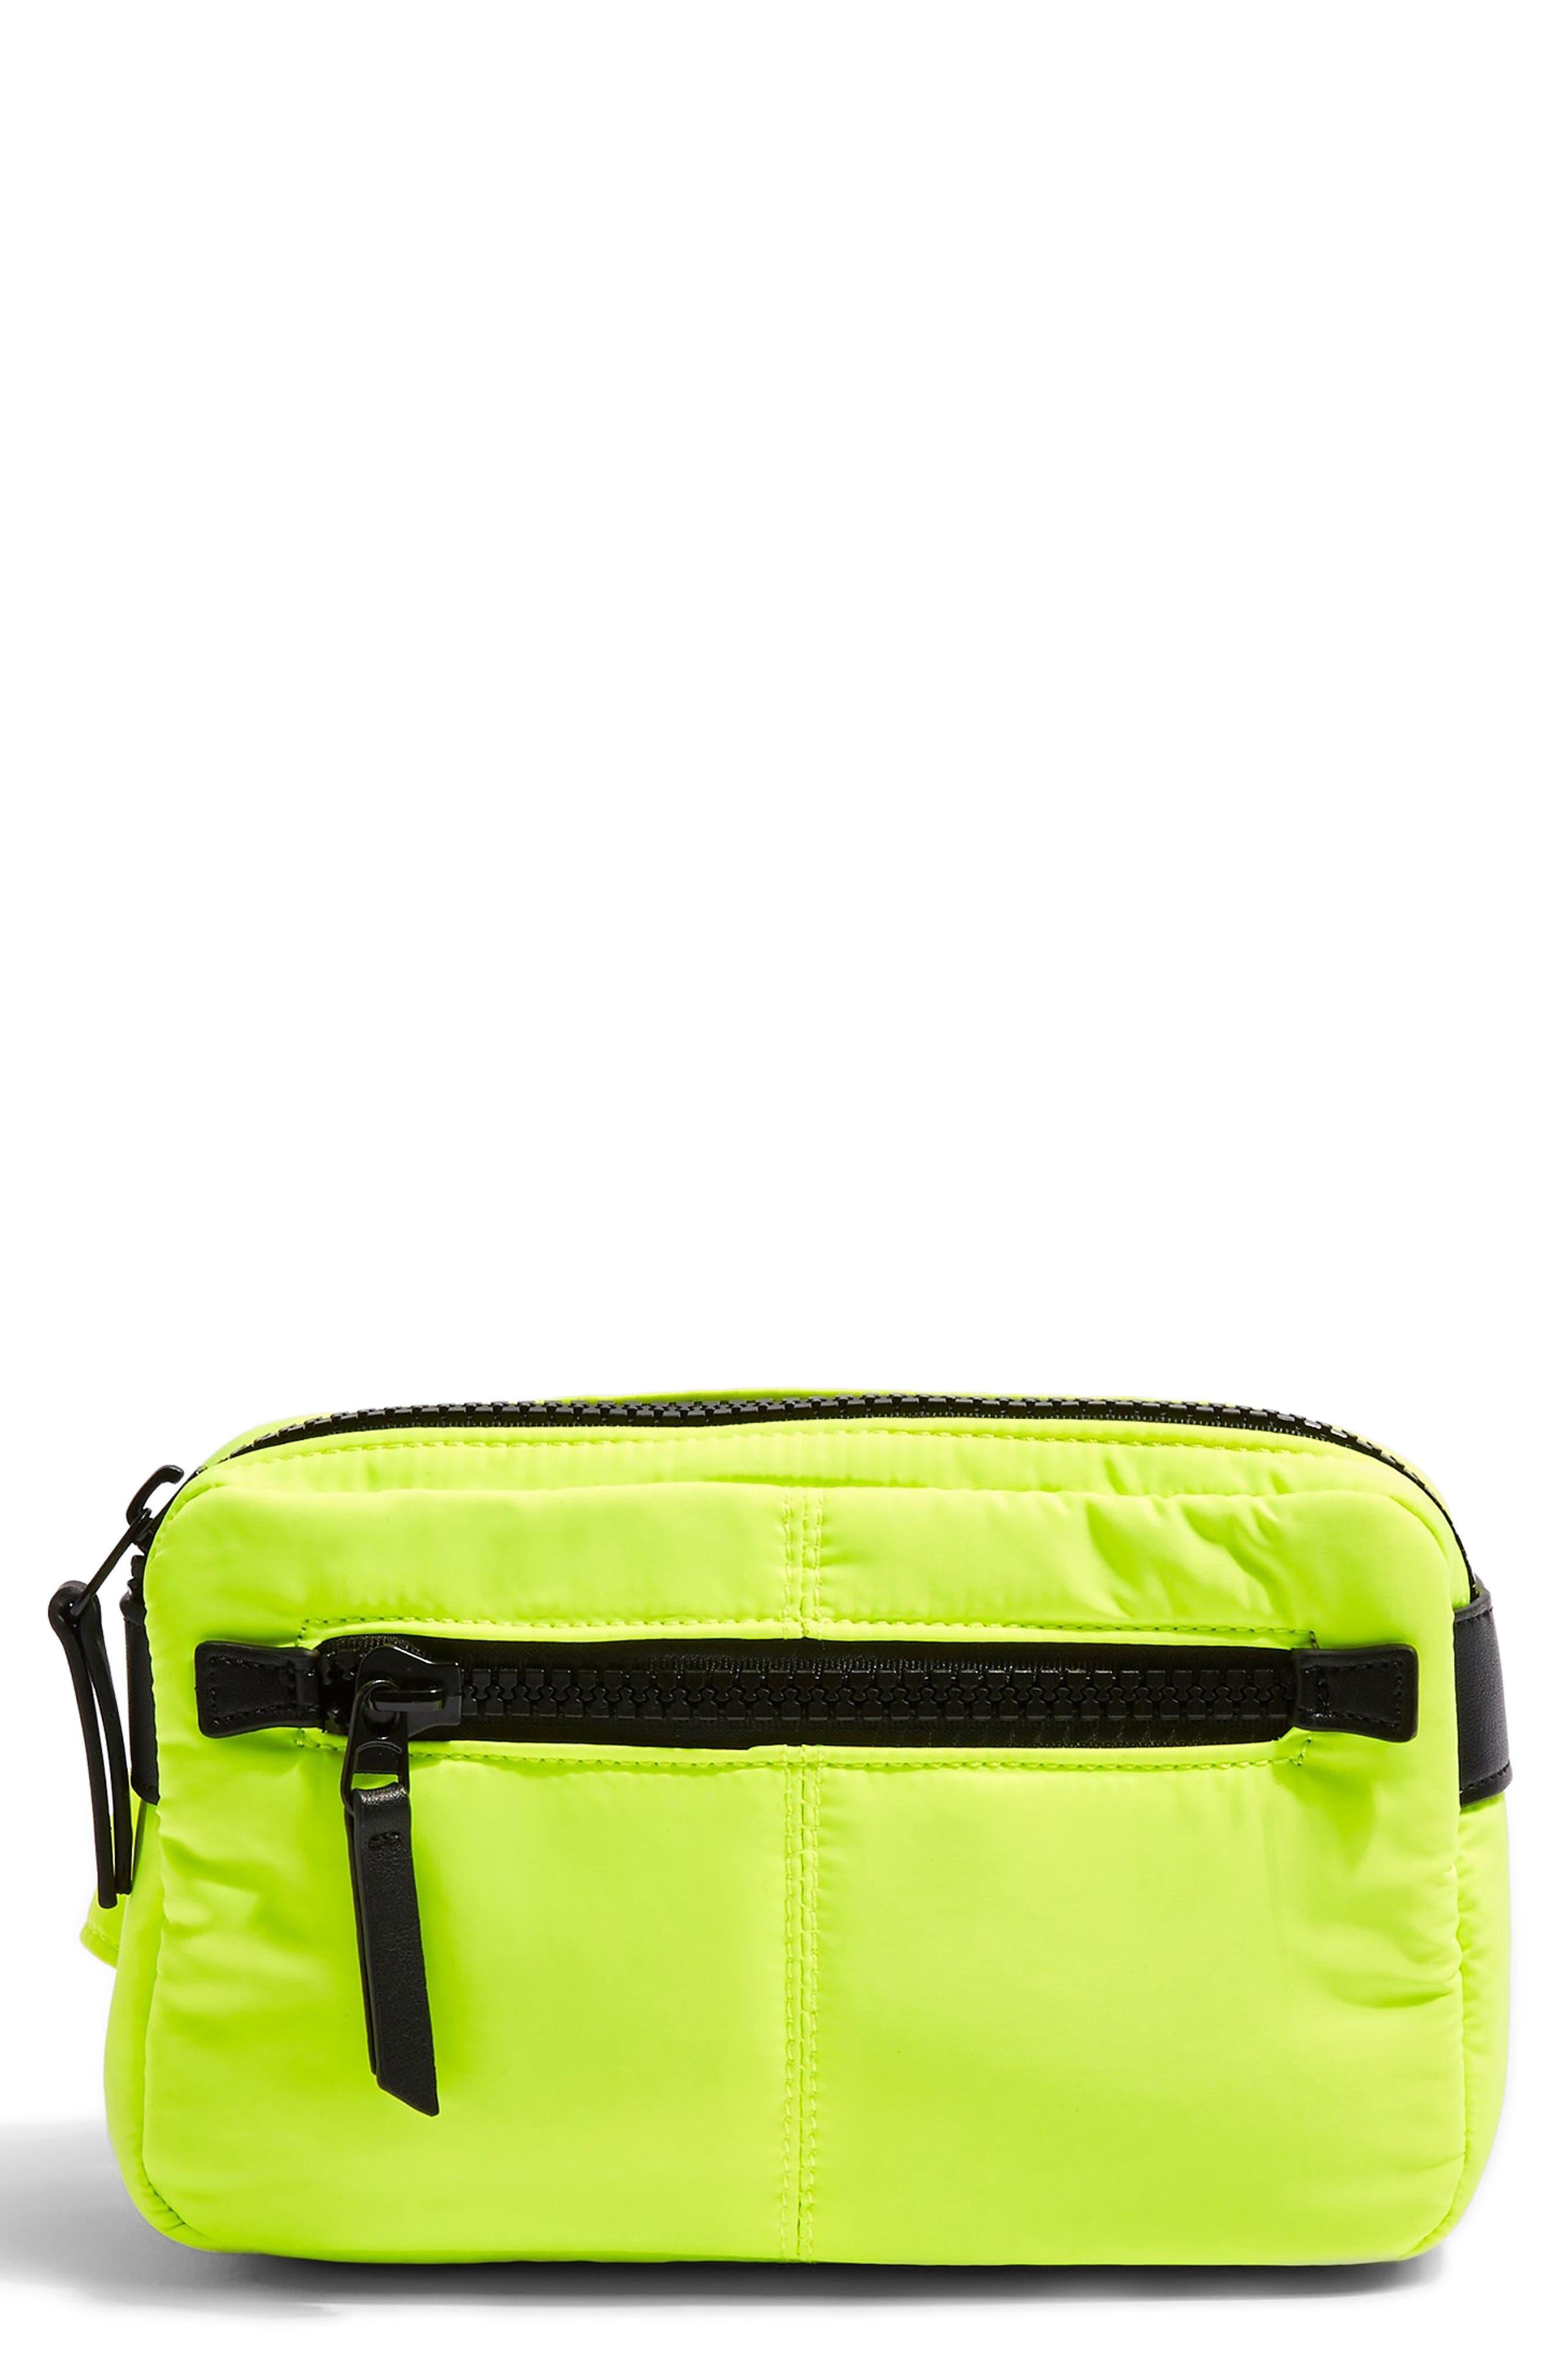 Topshop Berlin Belt Bag - Yellow 8bb7e987cf8b9